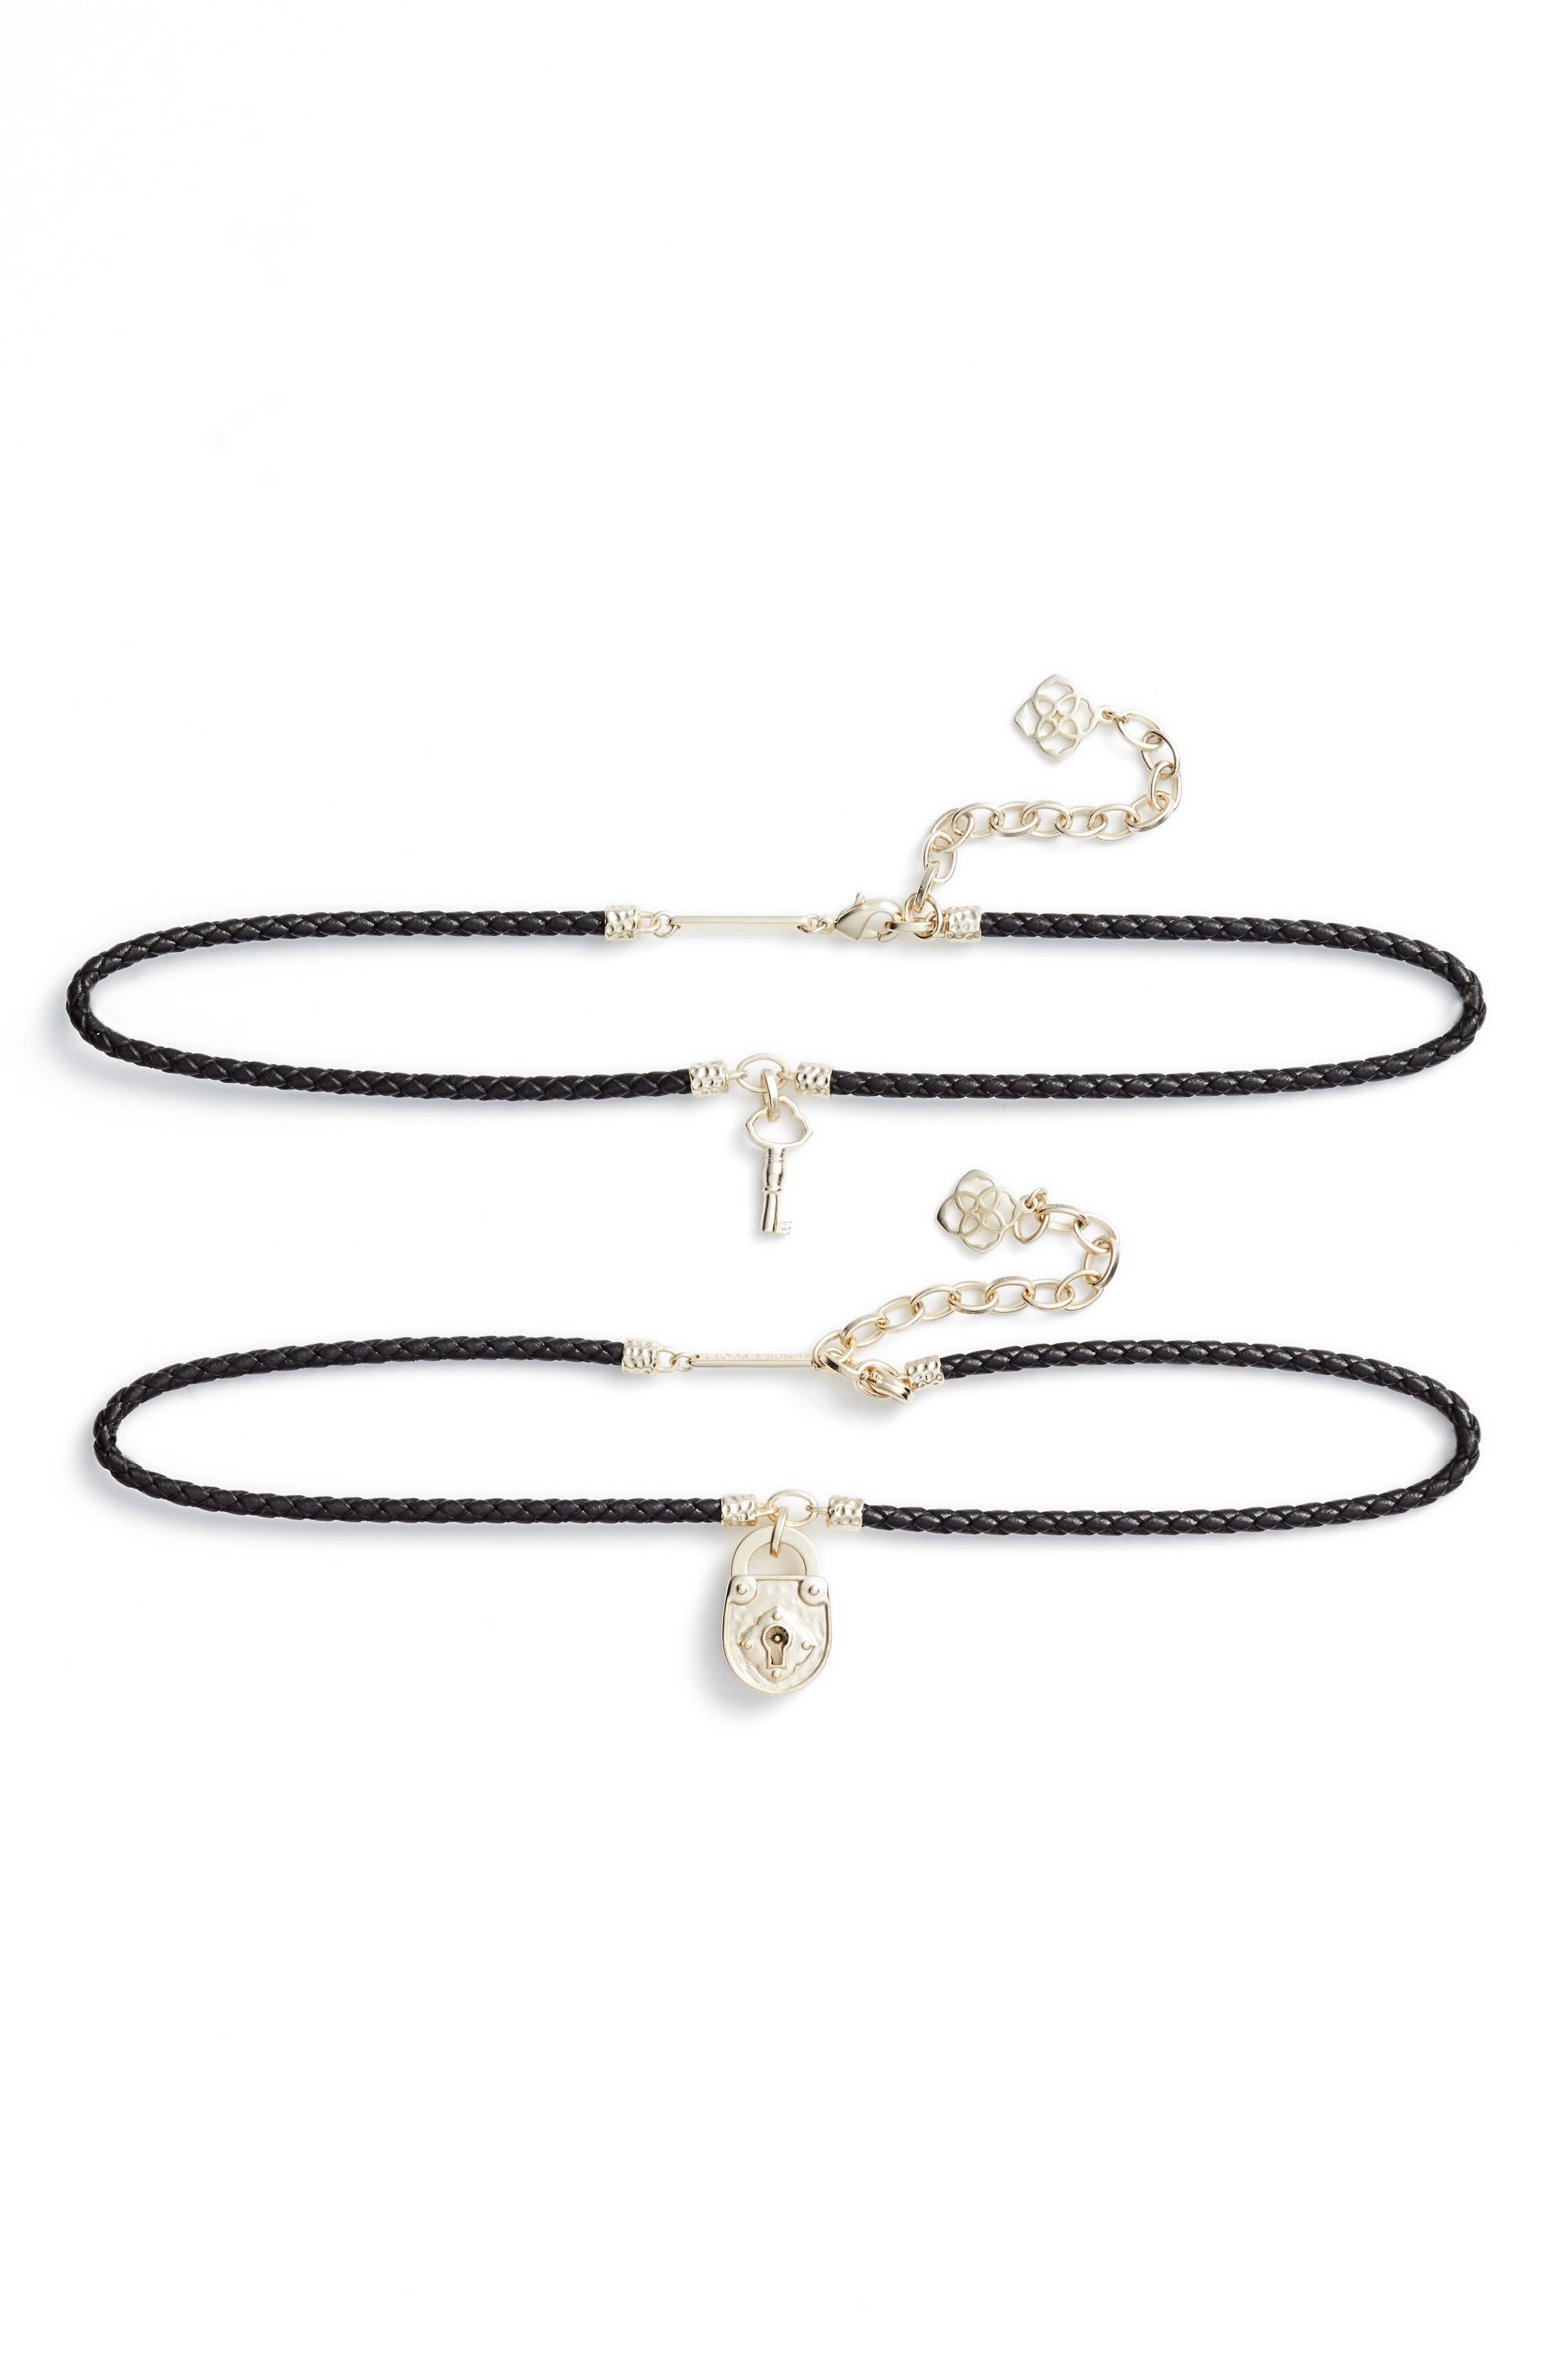 Kendra Scott Sunny Set of 2 Choker Necklaces